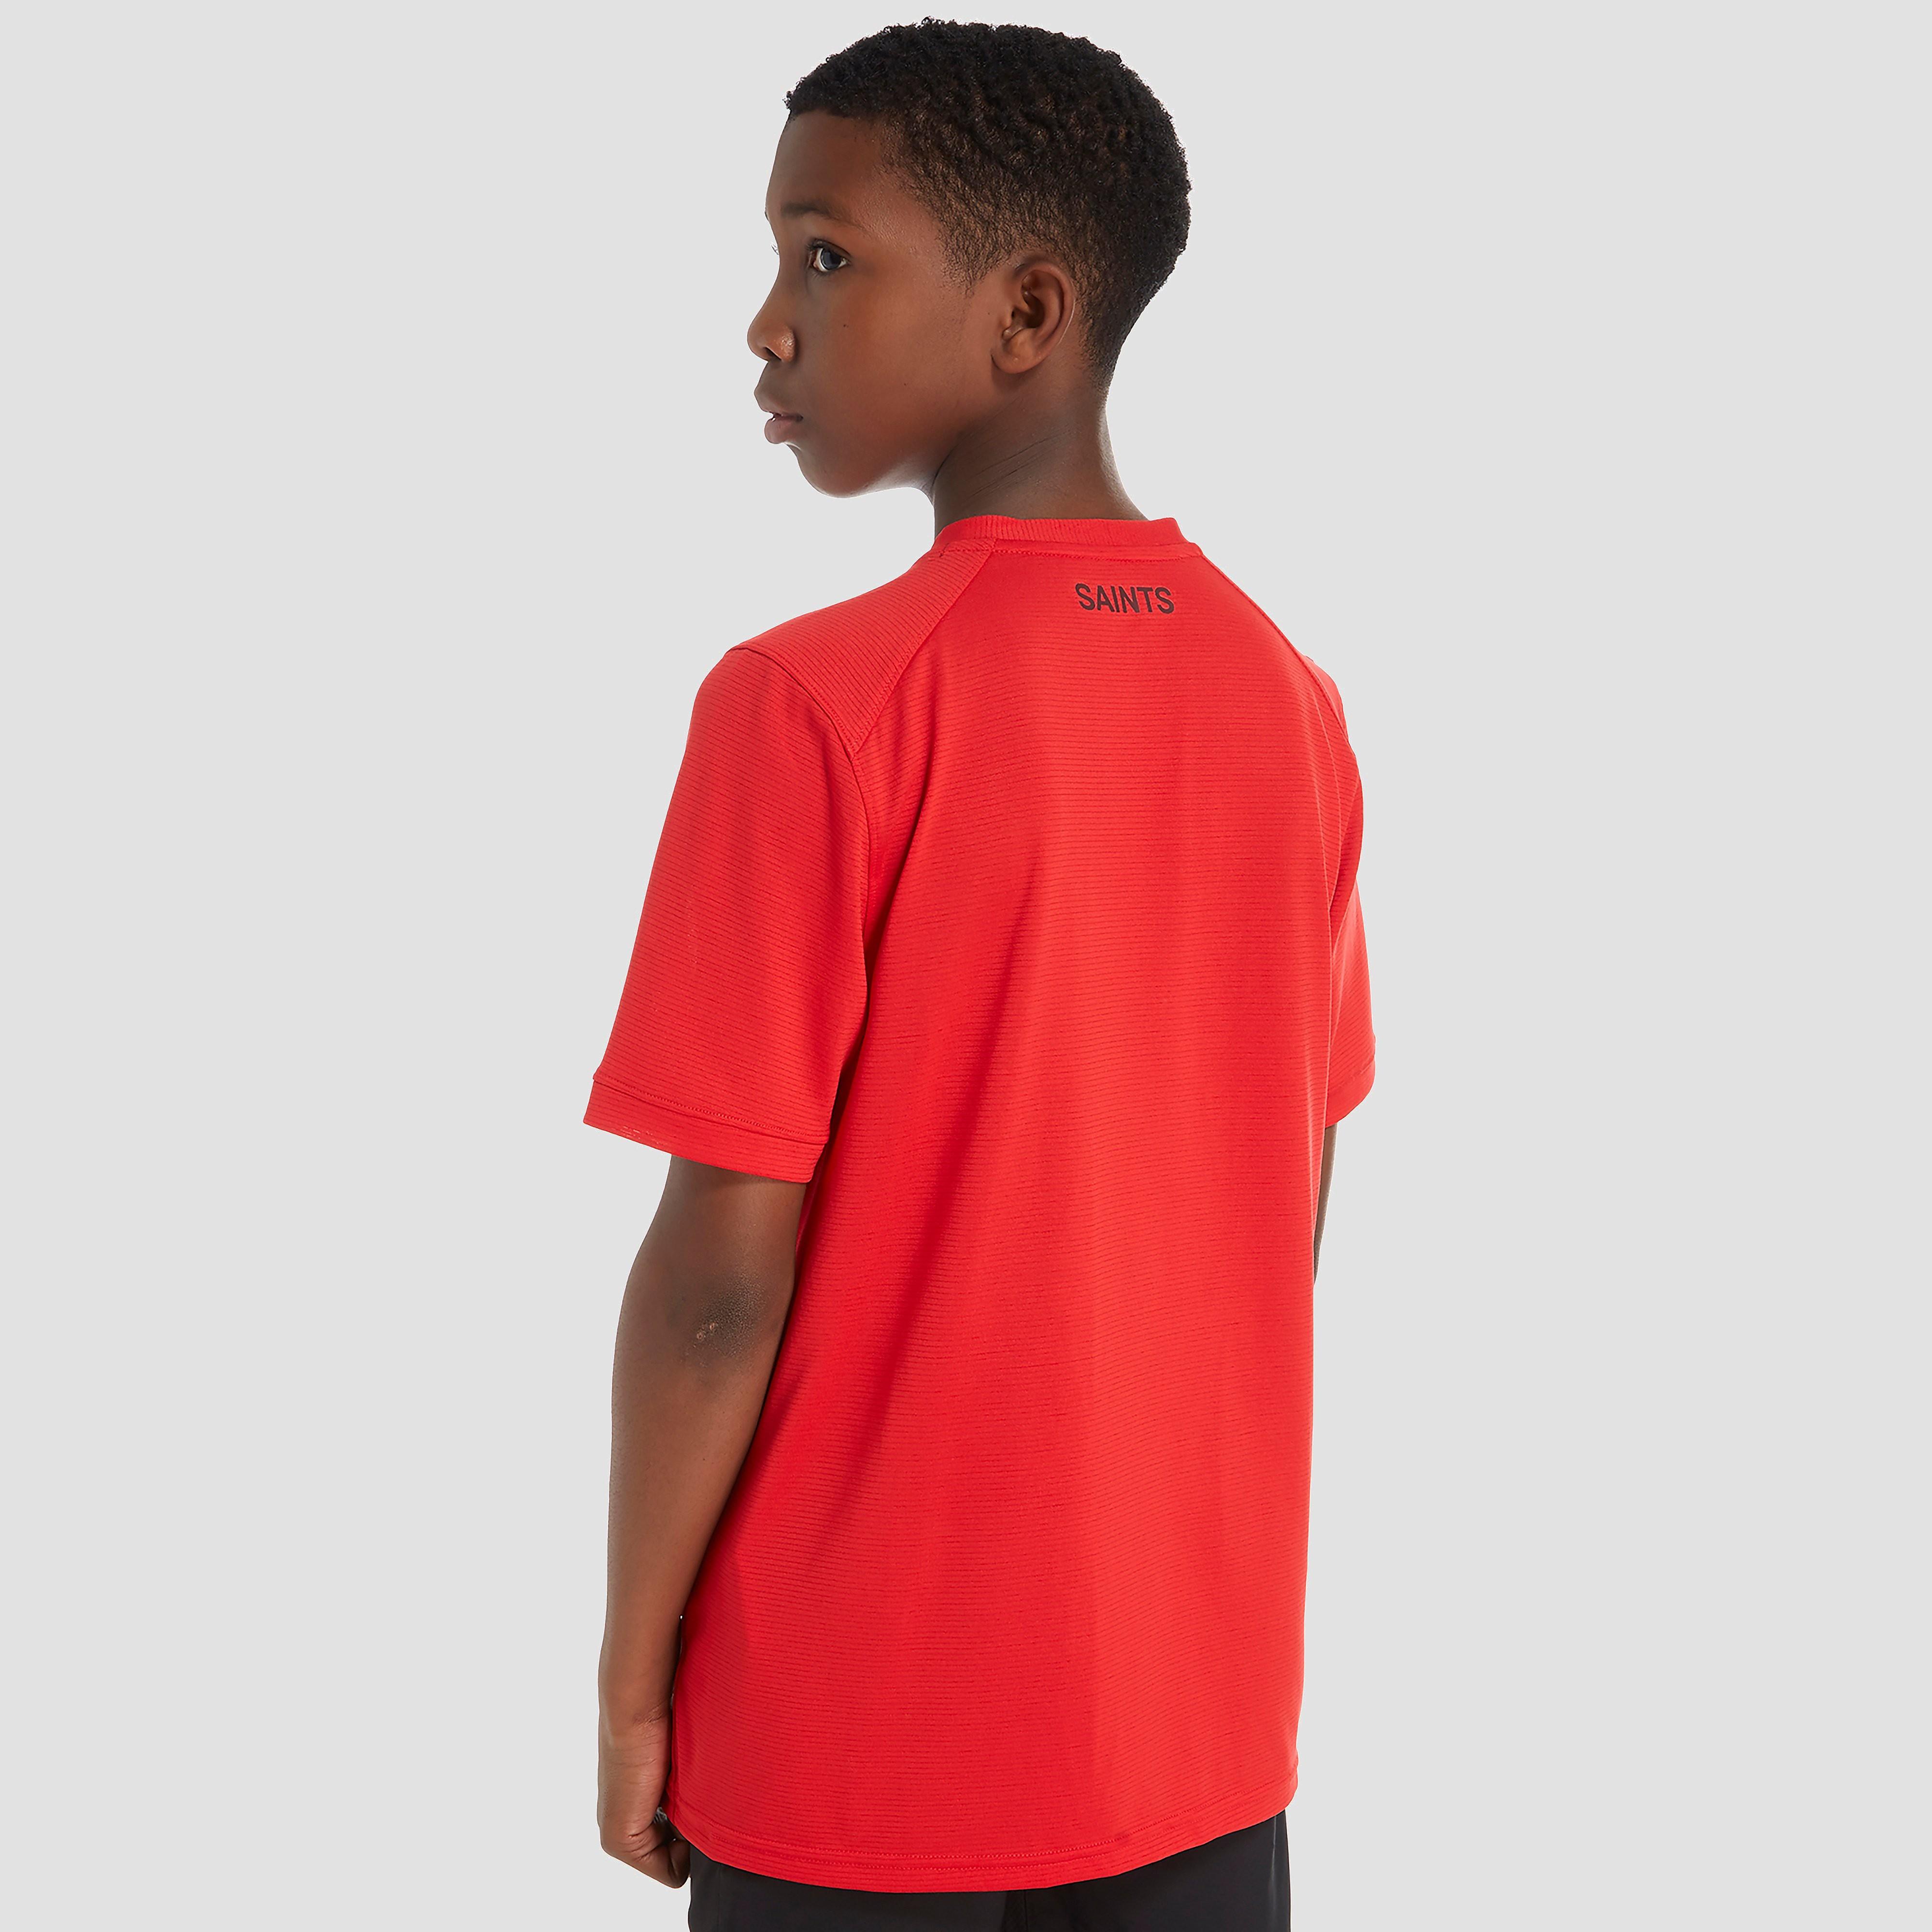 Under Armour Southampton FC Junior Training T-Shirt